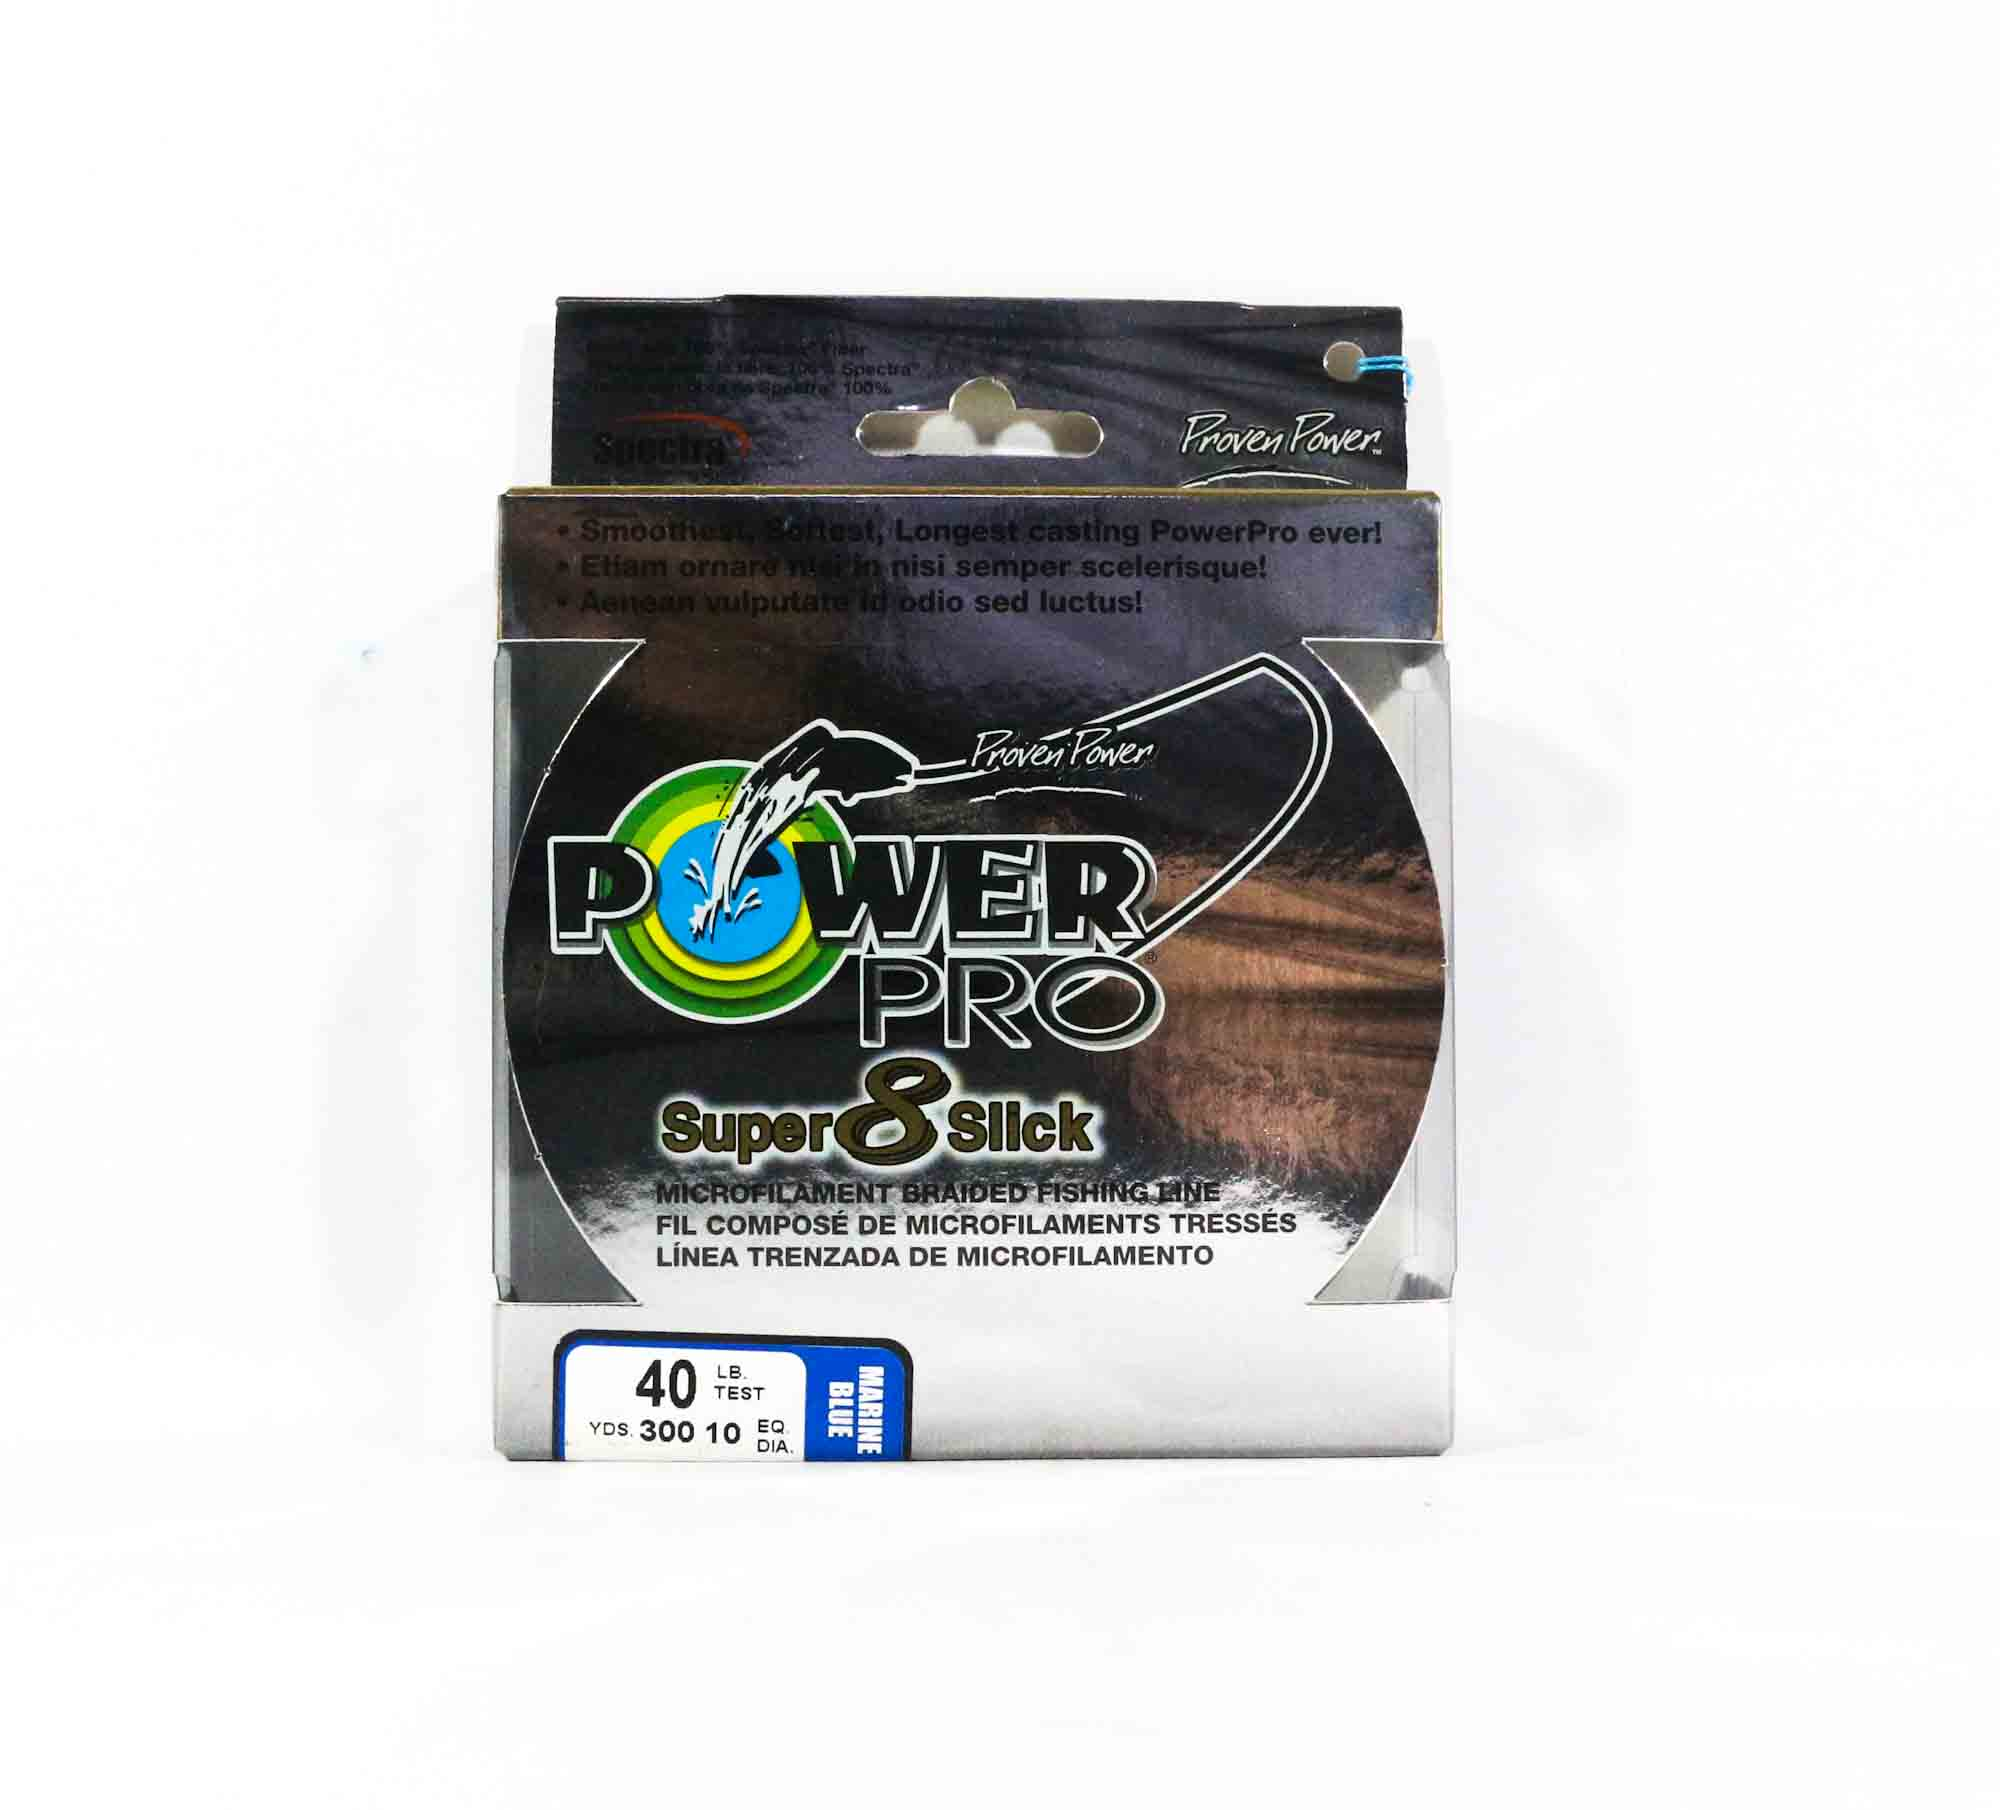 Power Pro Super 8 Slick Spectra Line 40lb by 300yds Blue (0251)